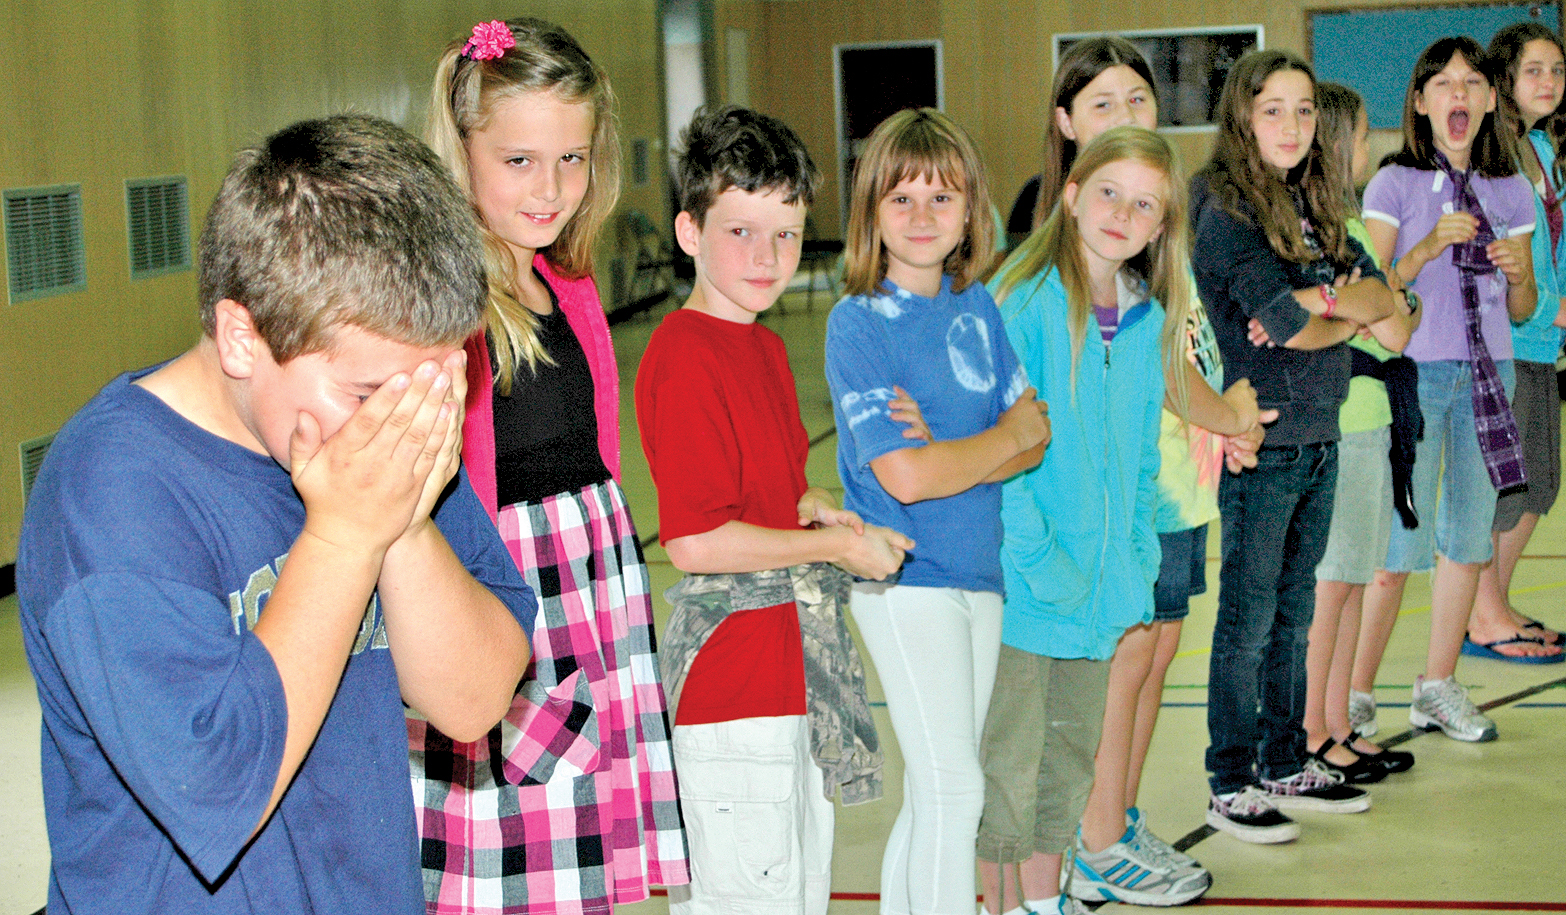 kids, class, boy, embarrassed, laugh